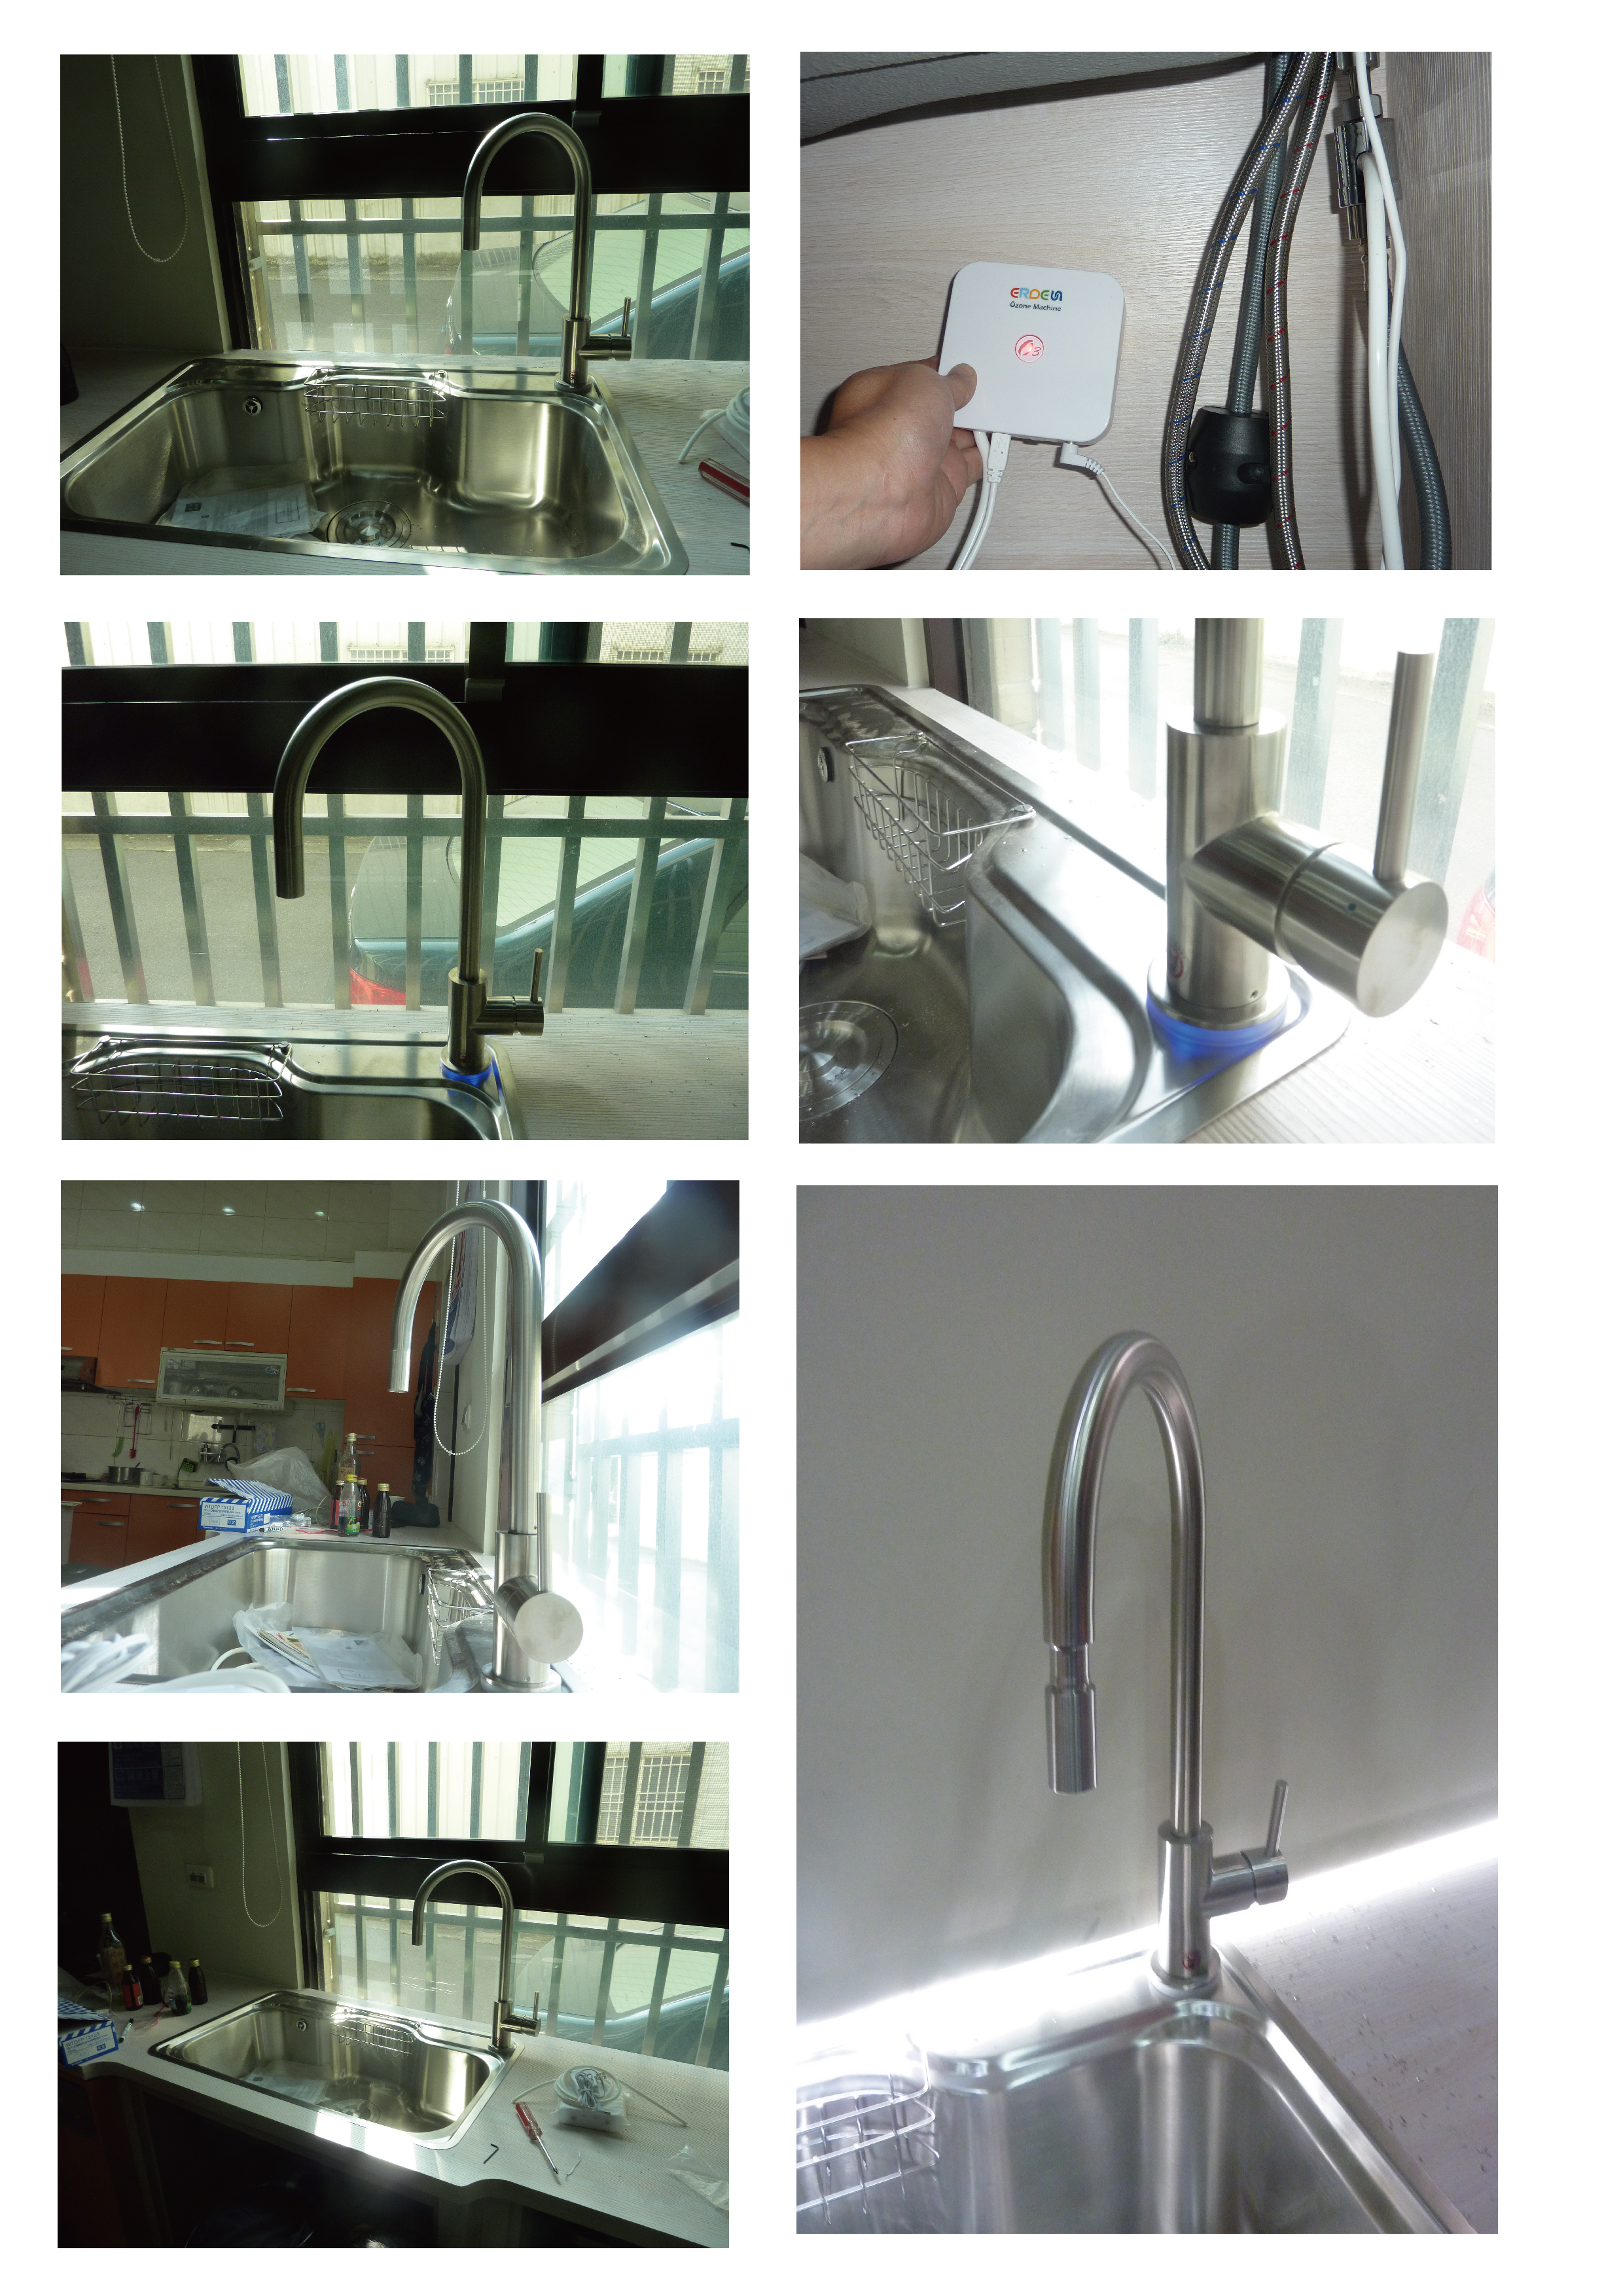 Fengyuan Herr Liu Kuchenarmatur Installation Diy Strongco News Und Events Strongco Company Ltd